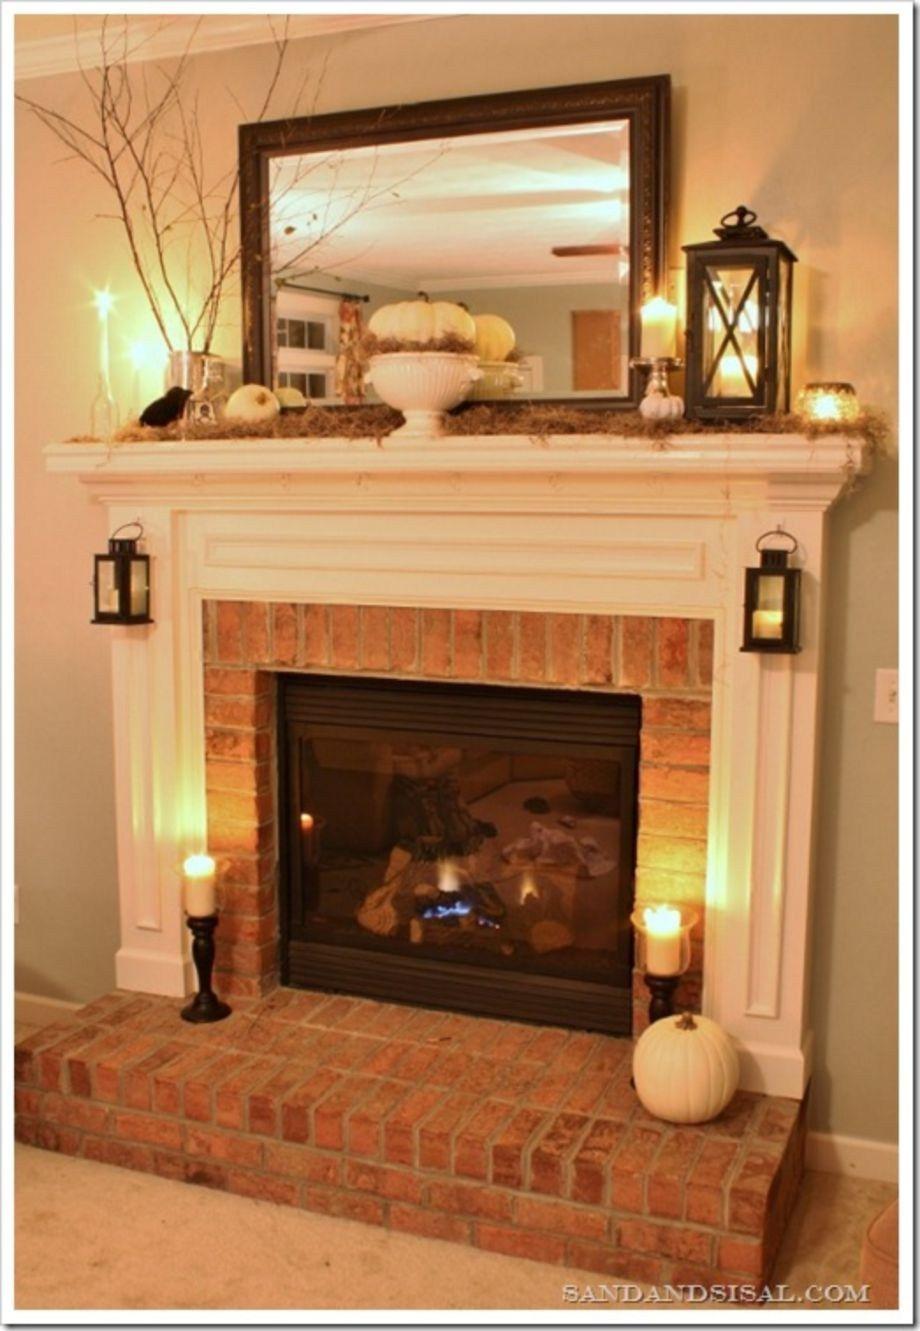 54 incredible diy brick fireplace makeover ideas brick